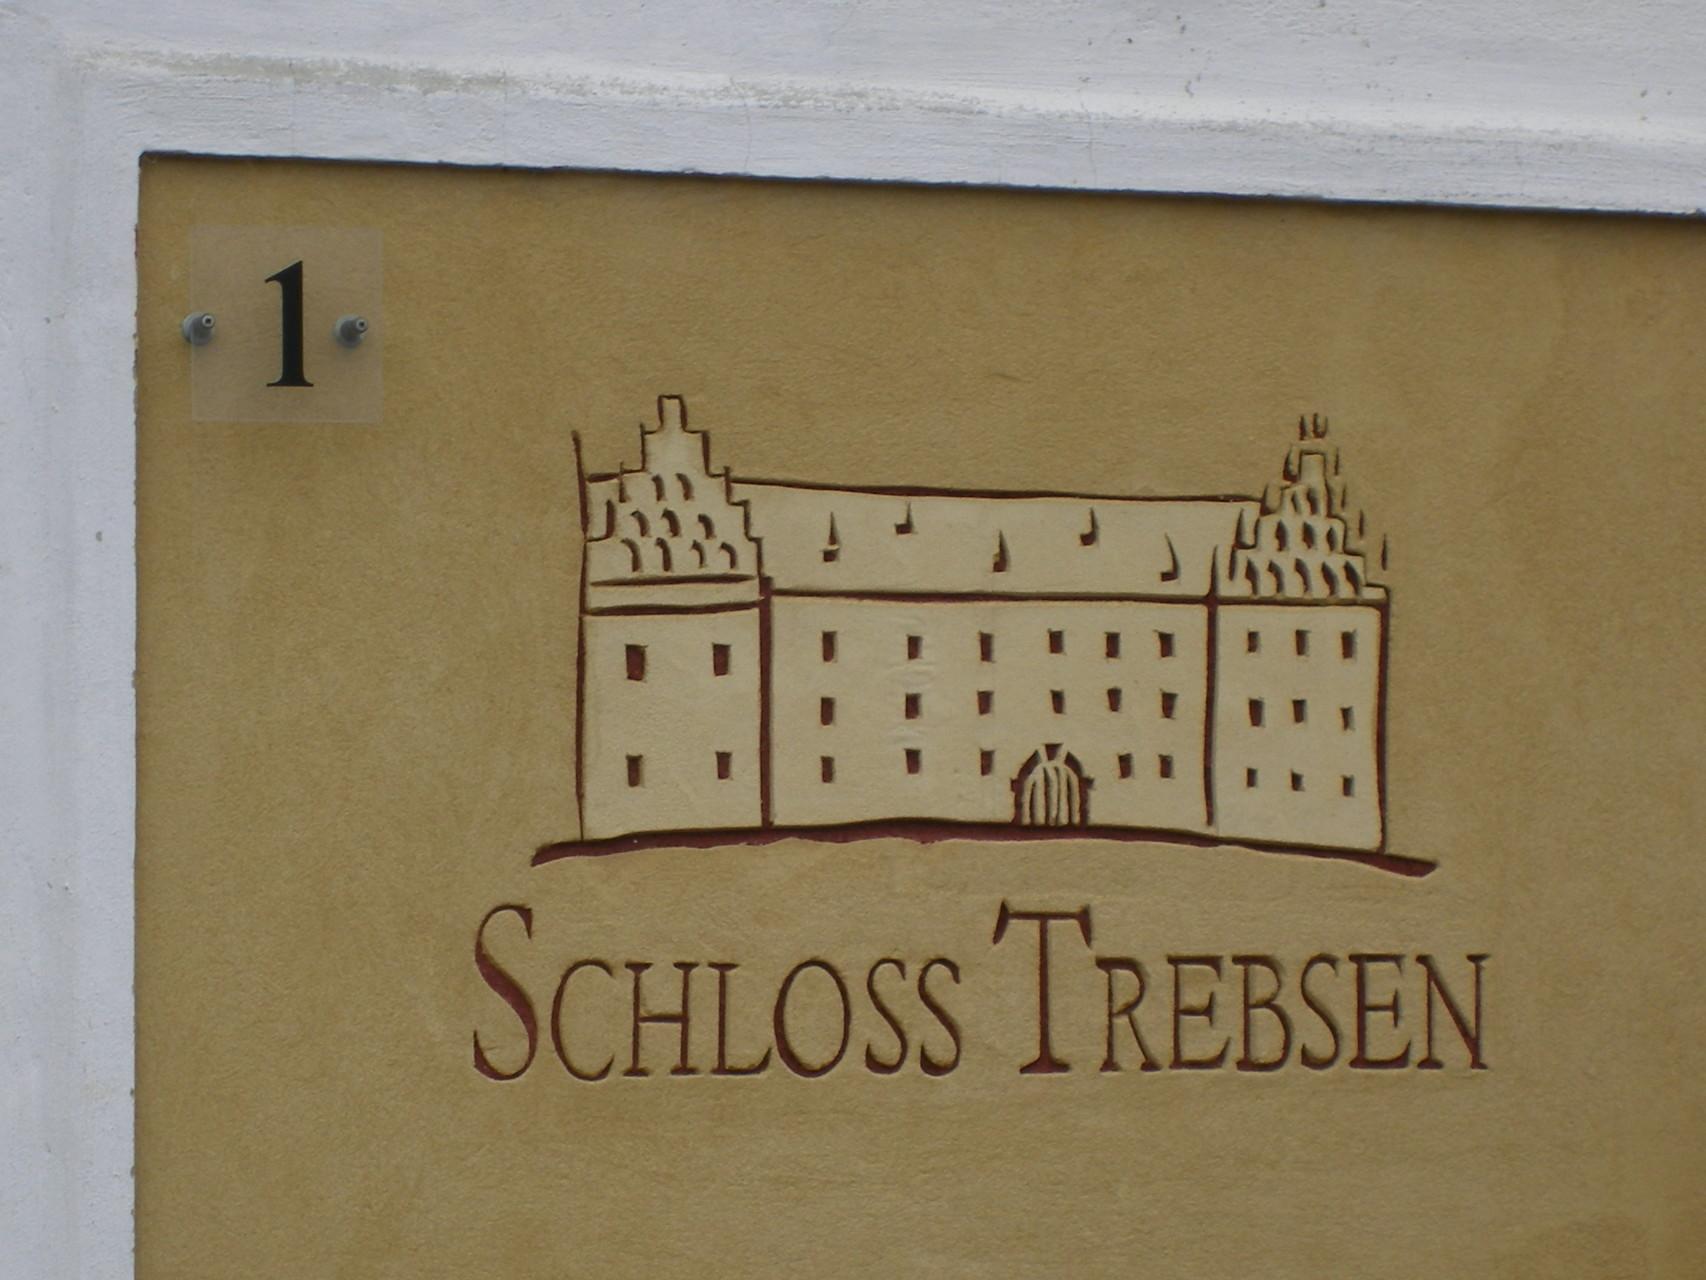 Schloss Trebsen Buchrose Glasfedern